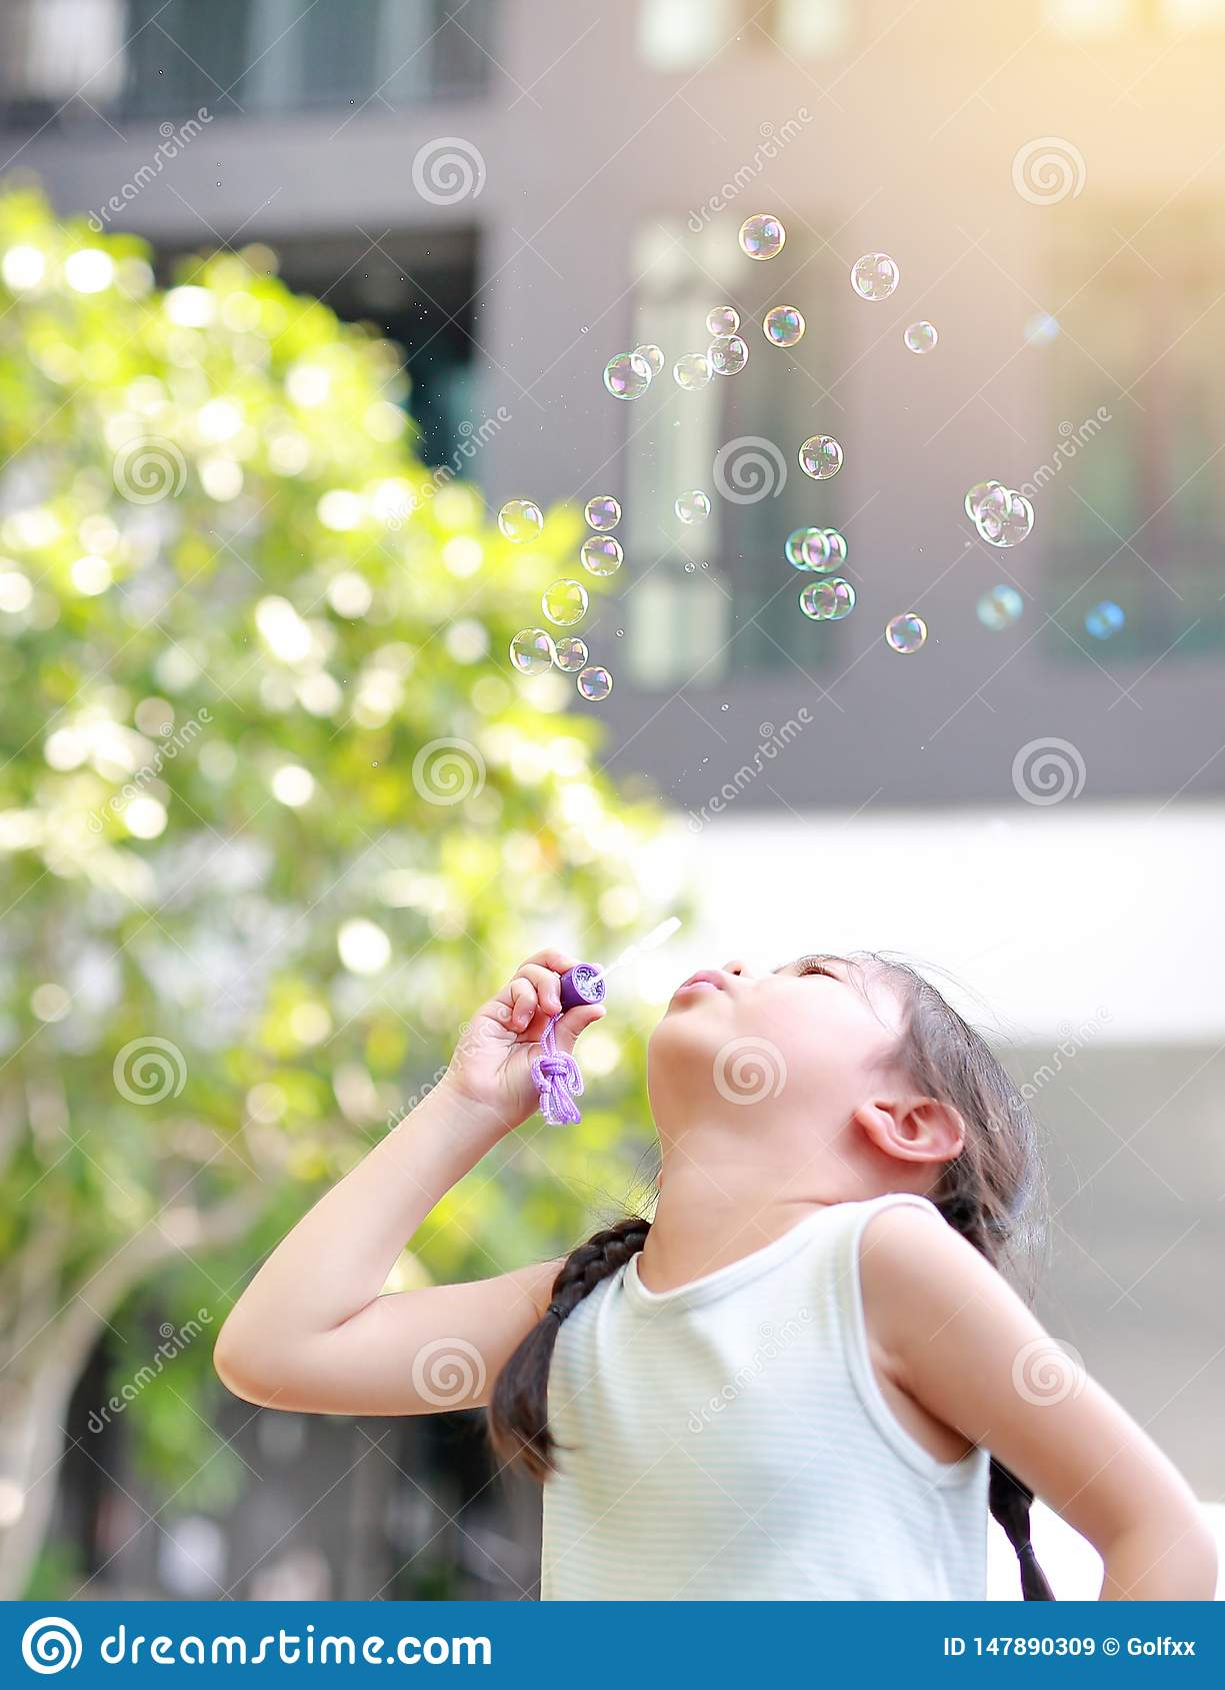 outdoor wanking bubble Asian